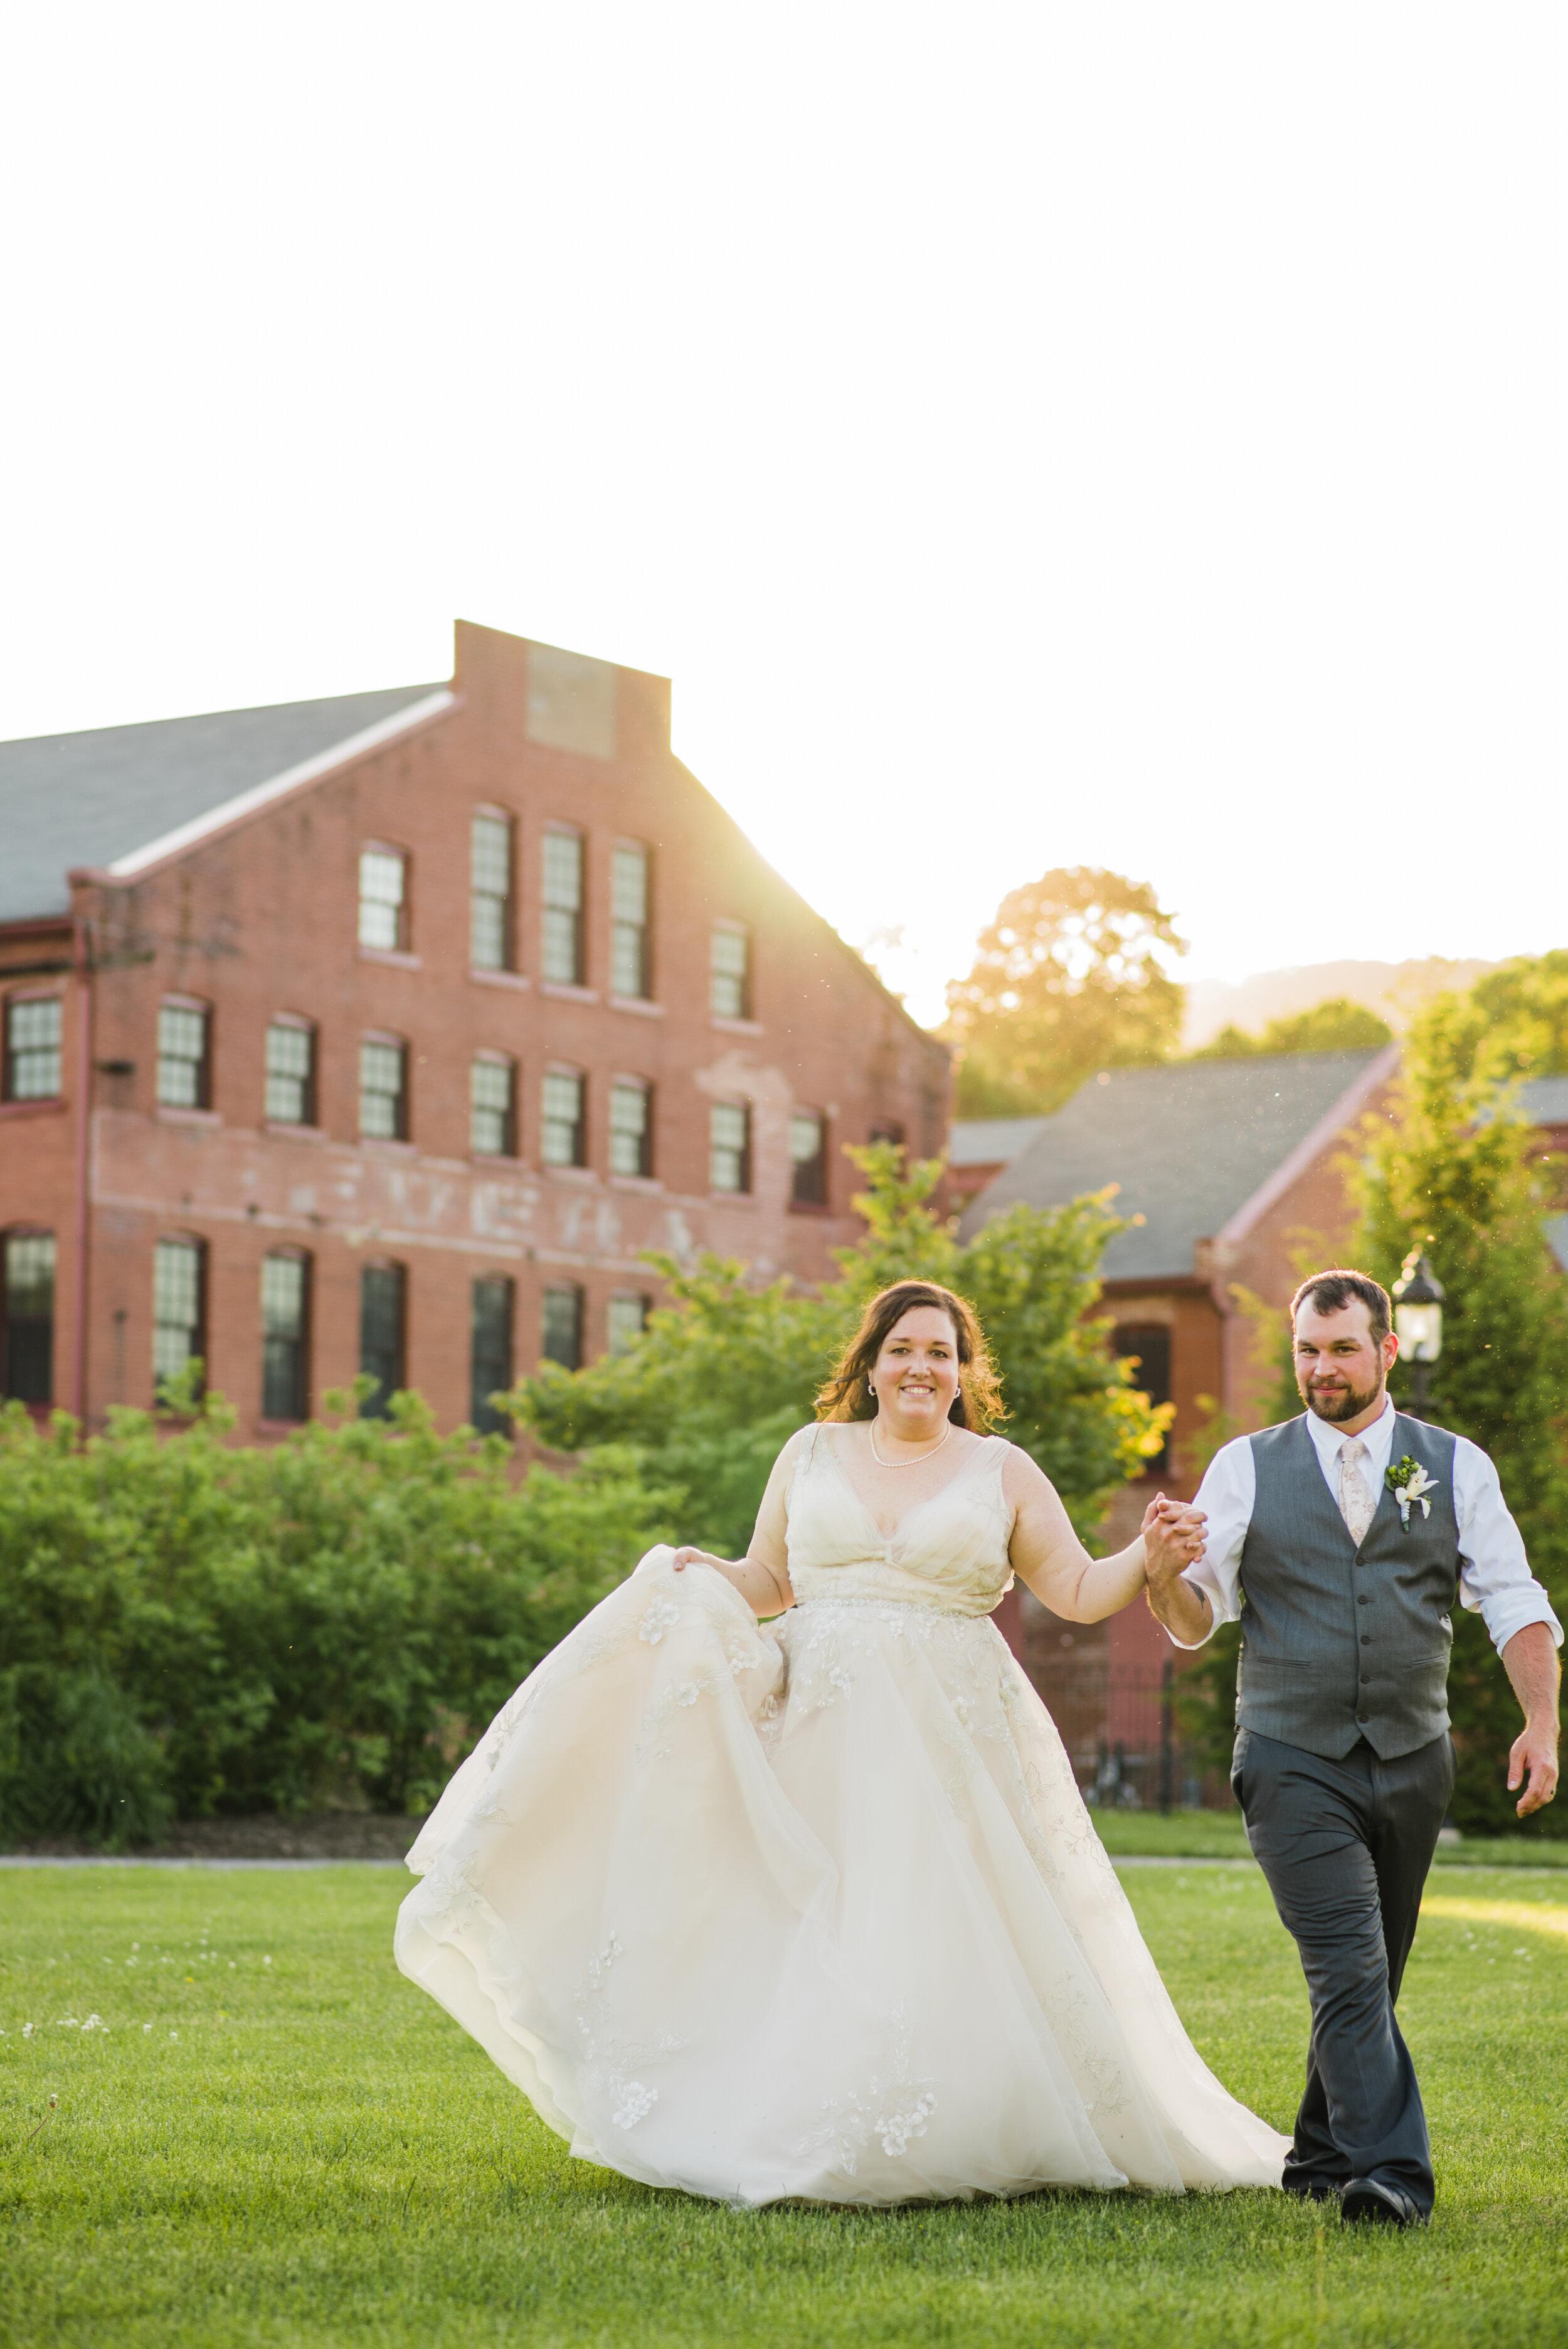 Wedding couple walking through a field at golden hour.